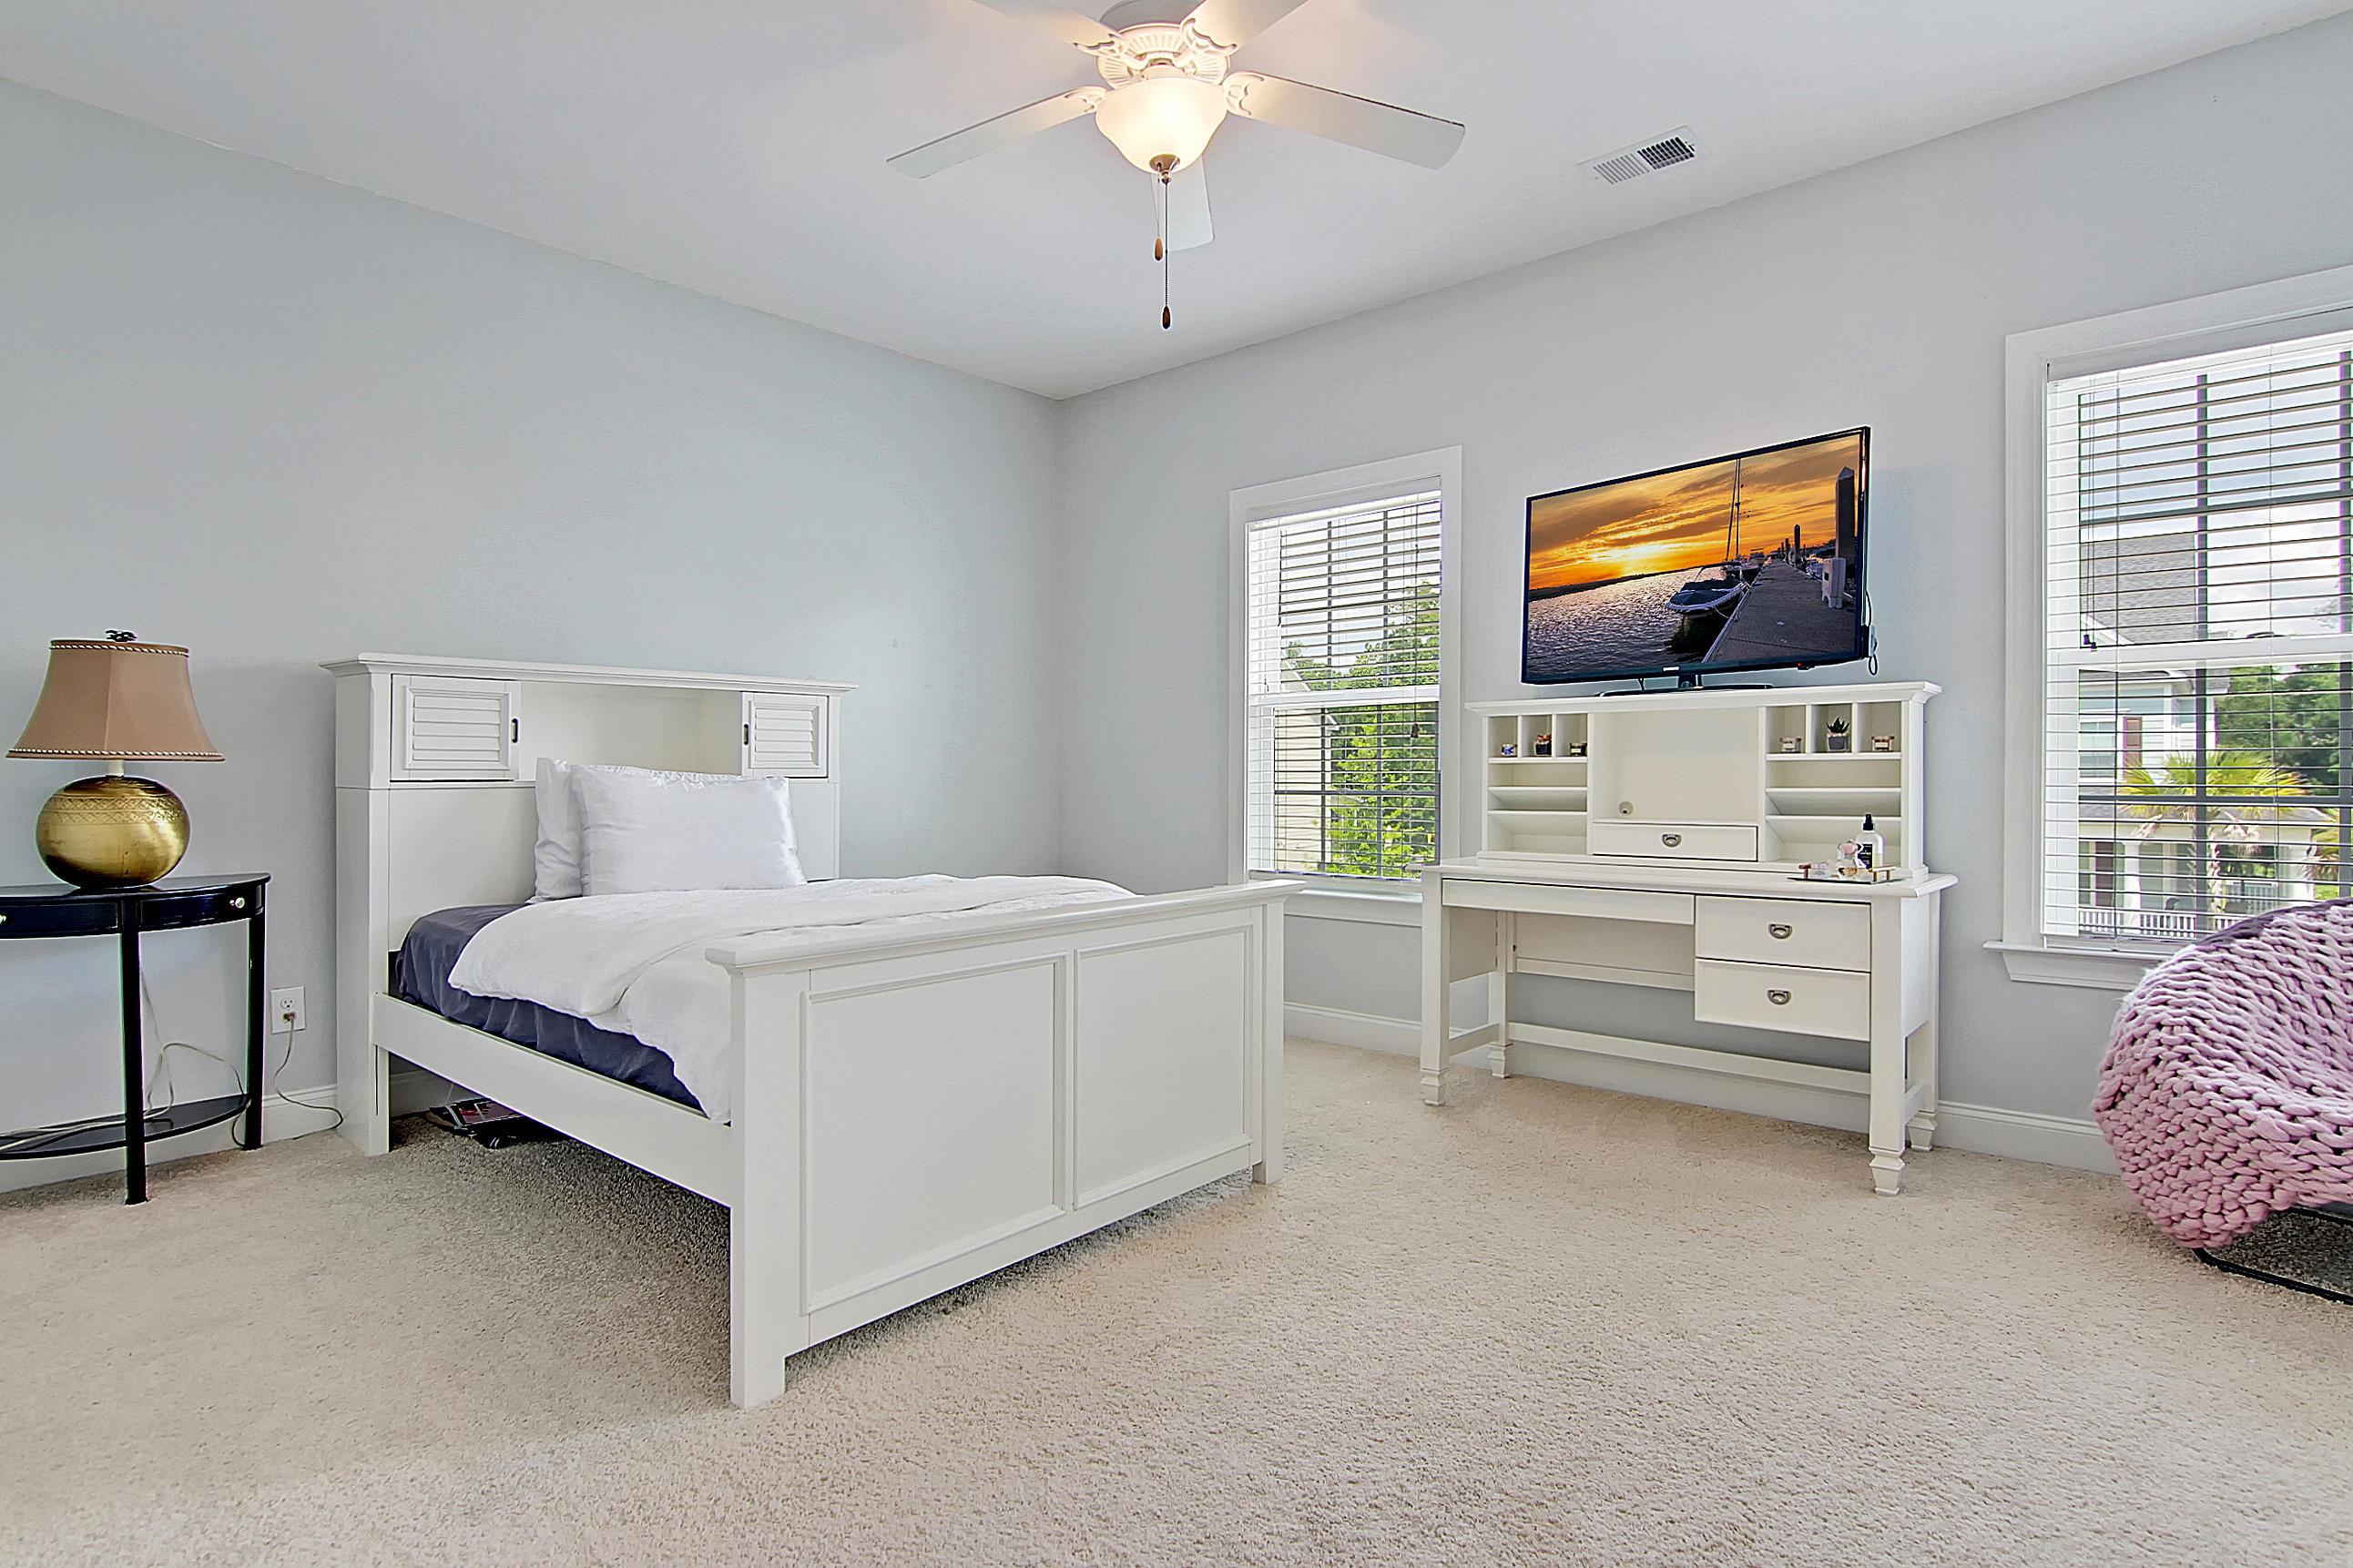 Dunes West Homes For Sale - 1332 Whisker Pole, Mount Pleasant, SC - 33